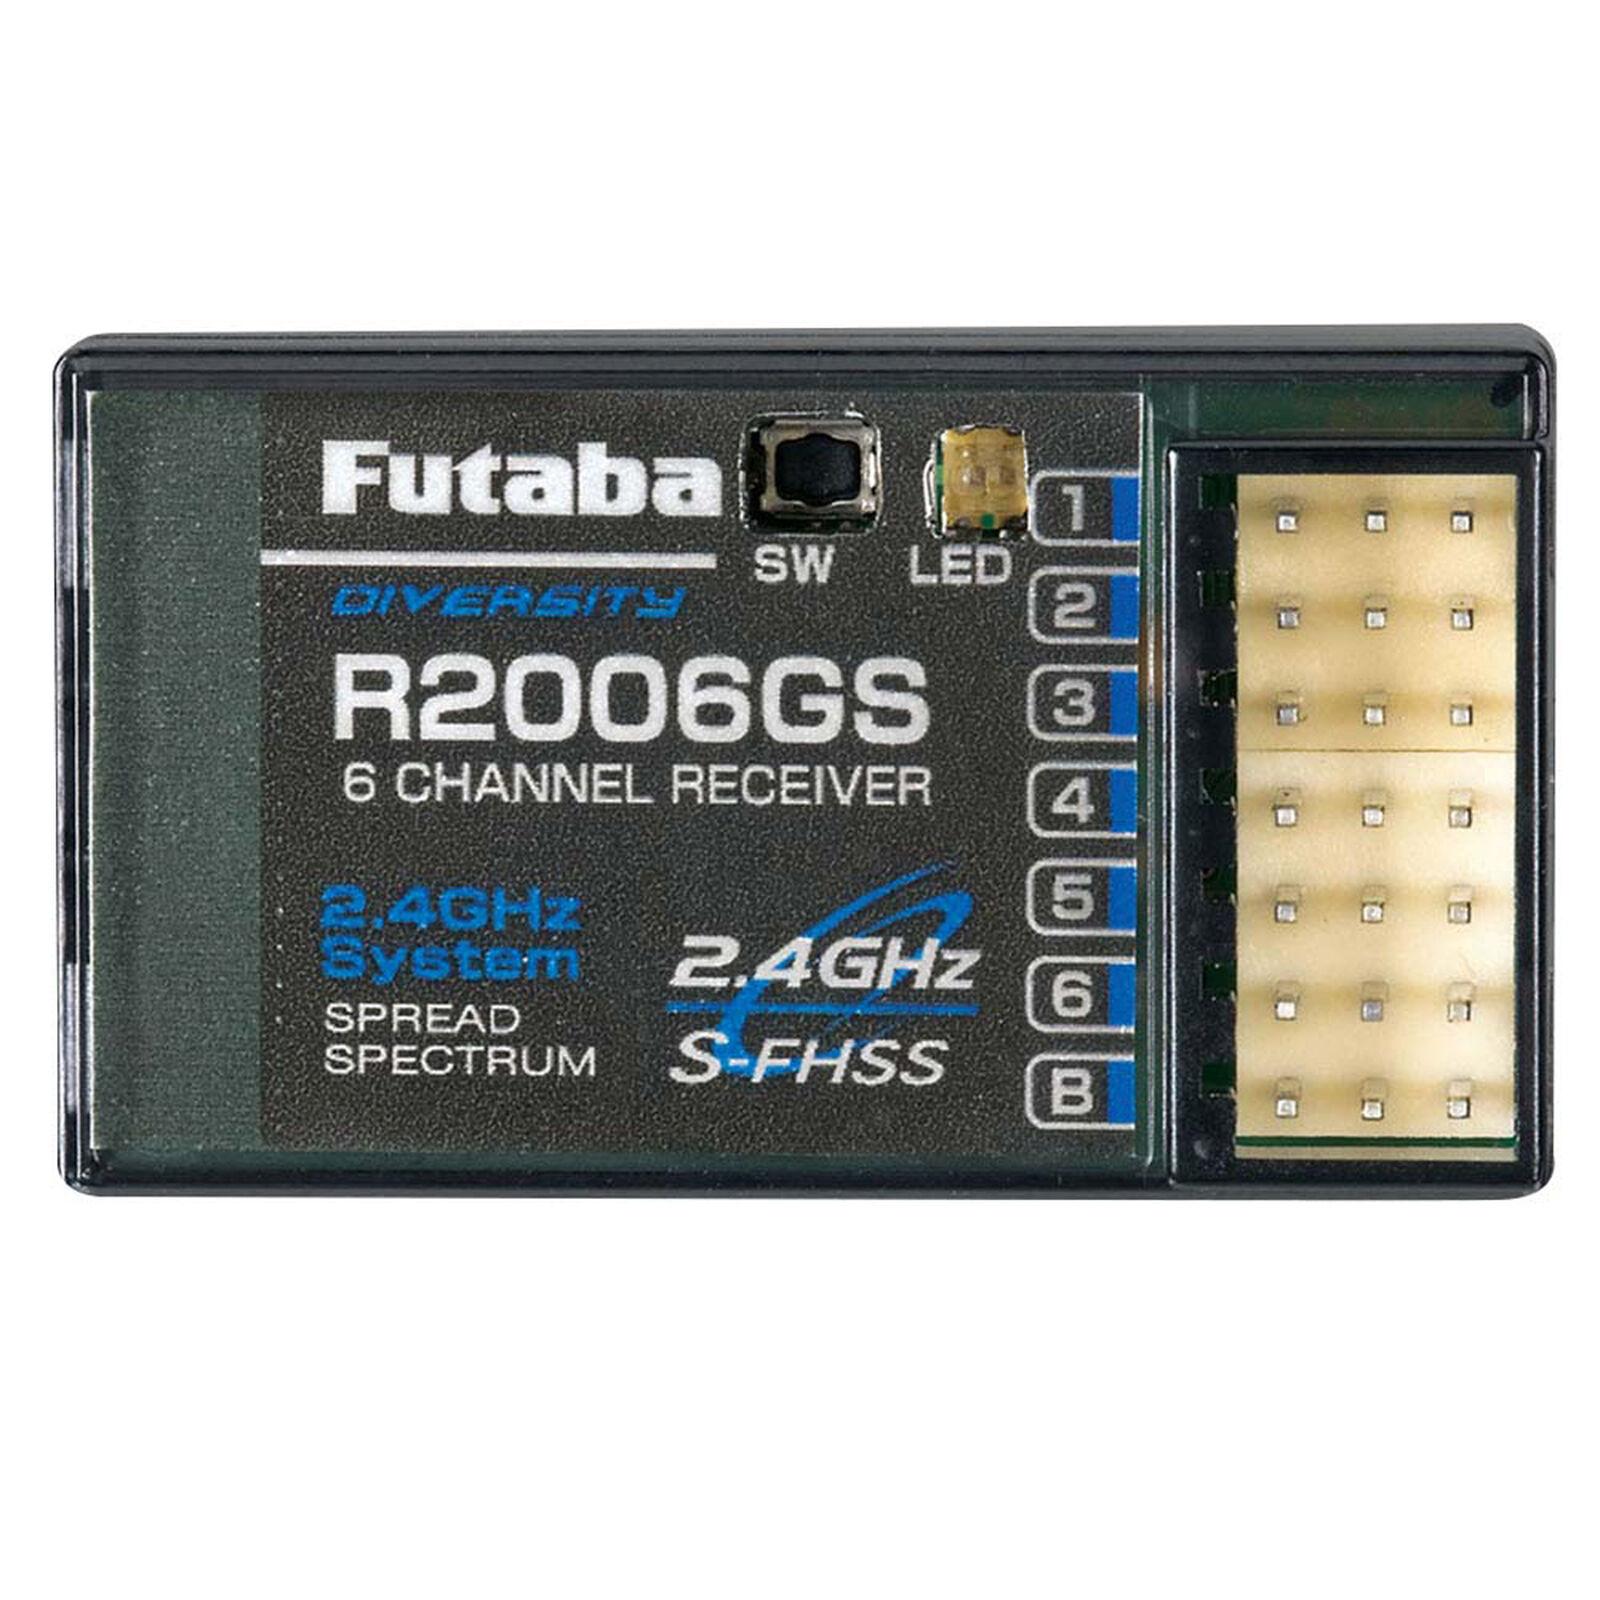 R2006GS 6-Channel S-FHSS Receiver 6J